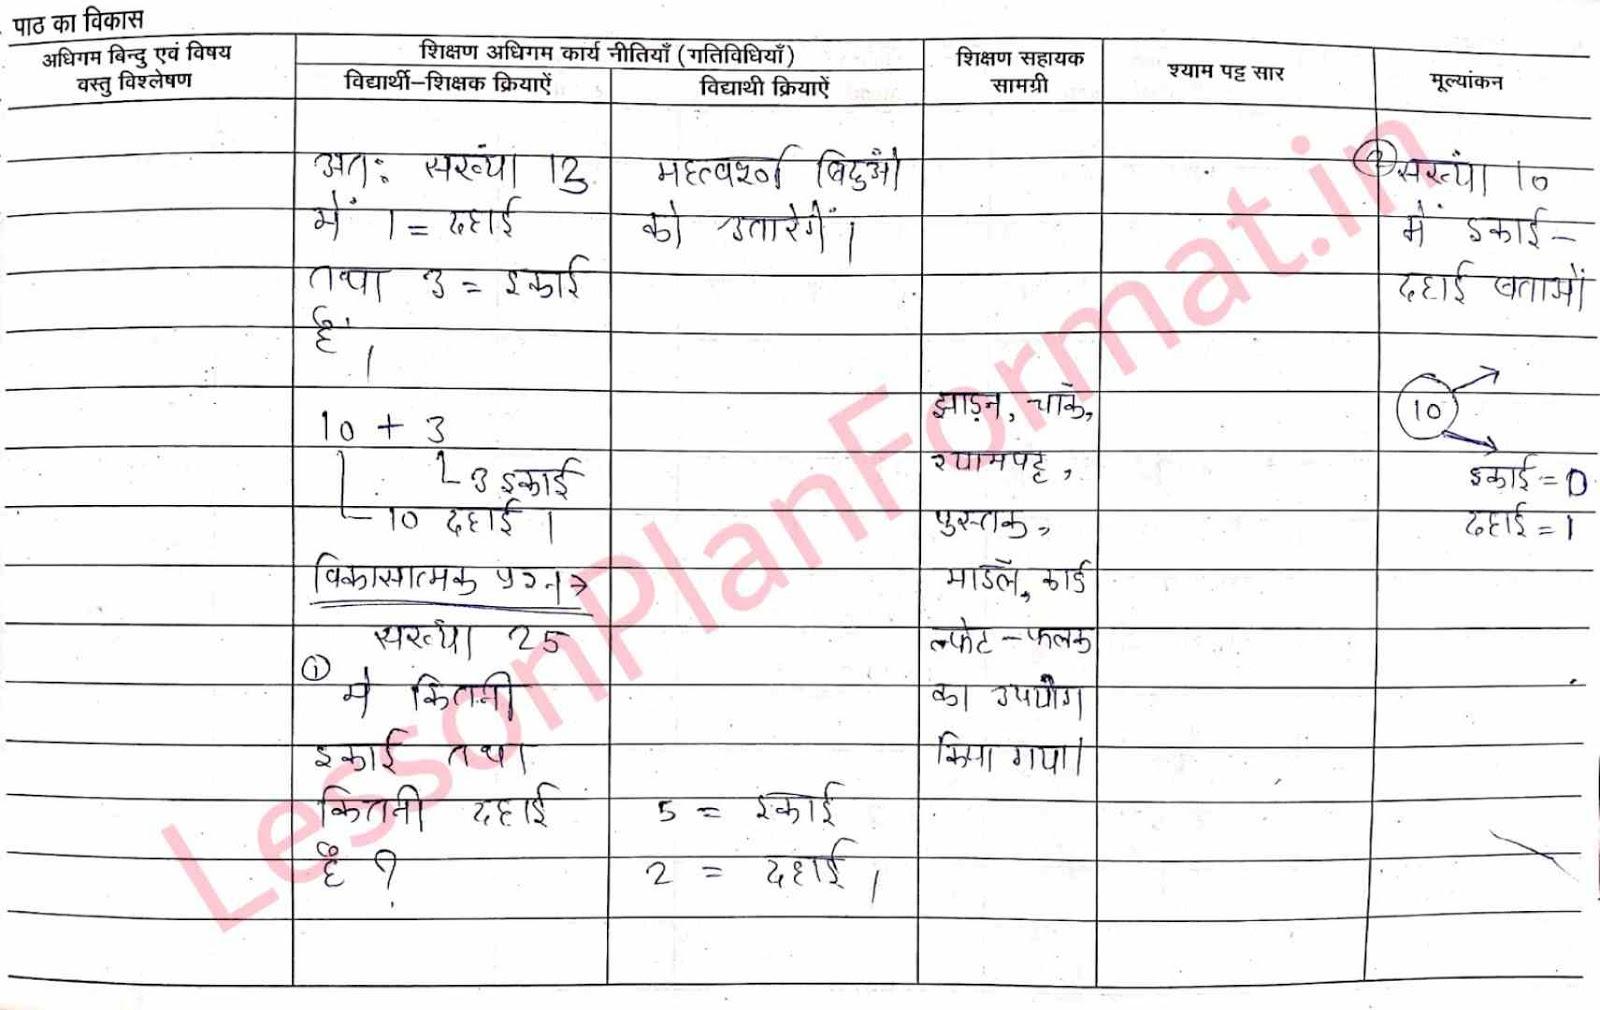 Ikai Dahai Maths Lesson Plan In Hindi | B.ed-Deled